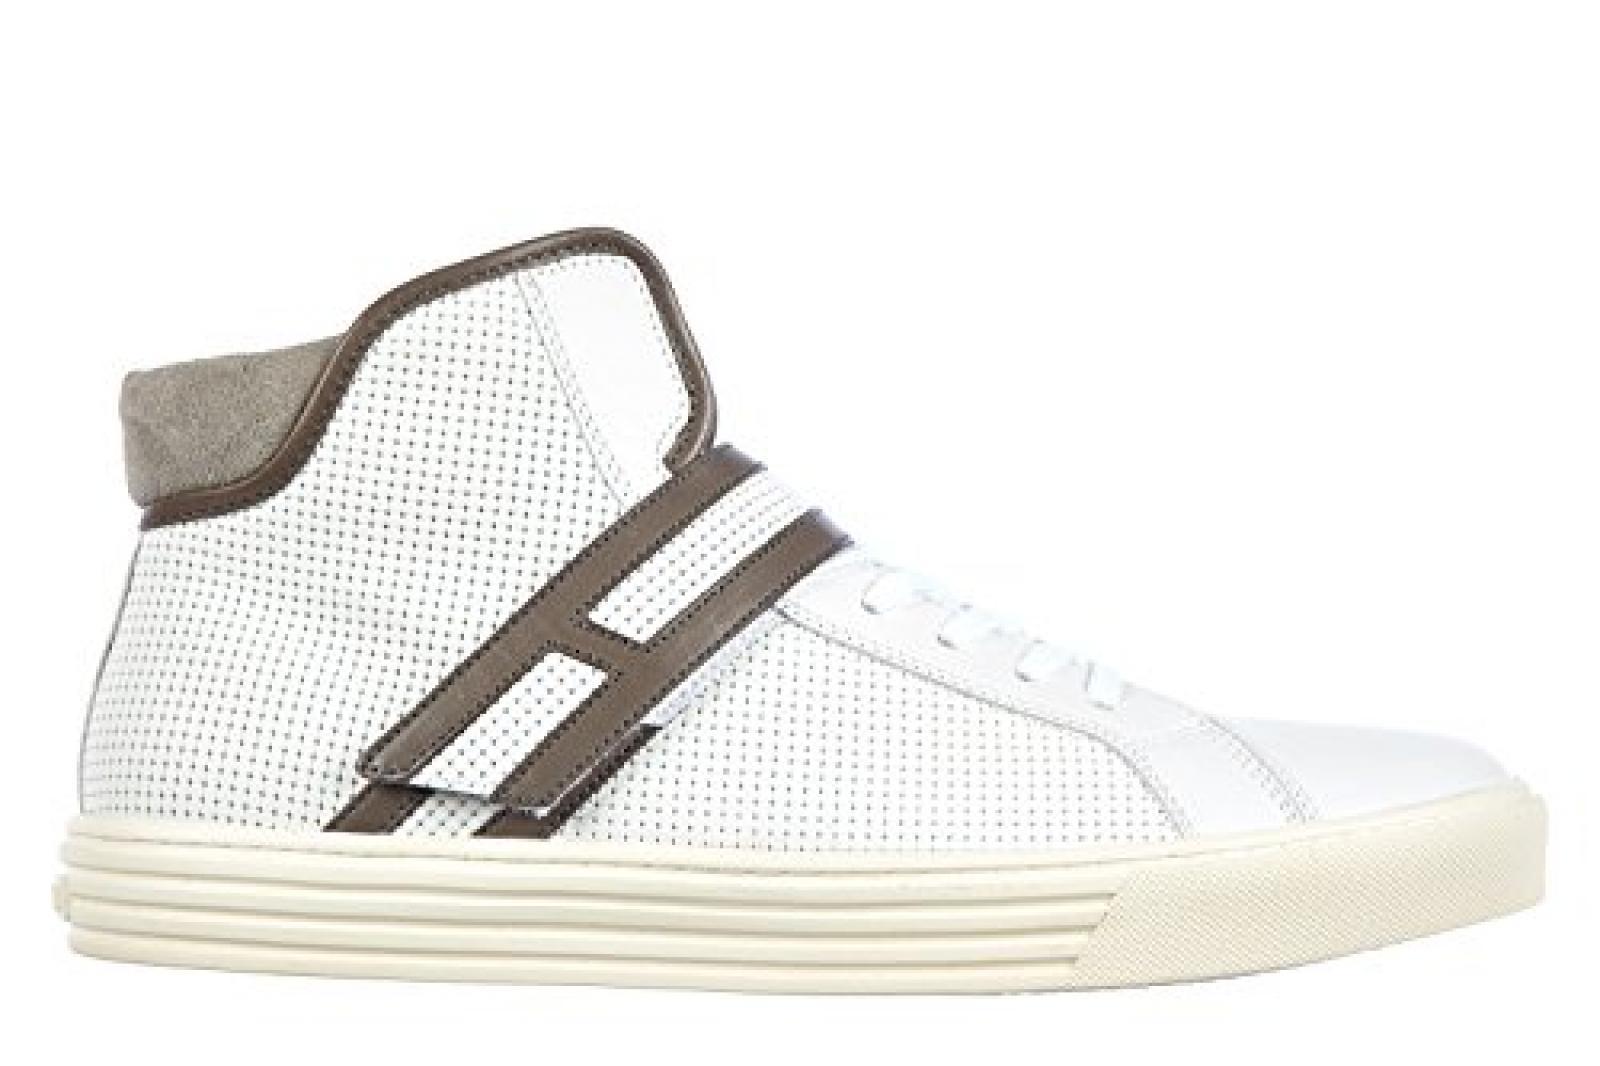 Hogan Herrenschuhe Herren Leder Schuhe High Sneakers rebel r206 Weiß